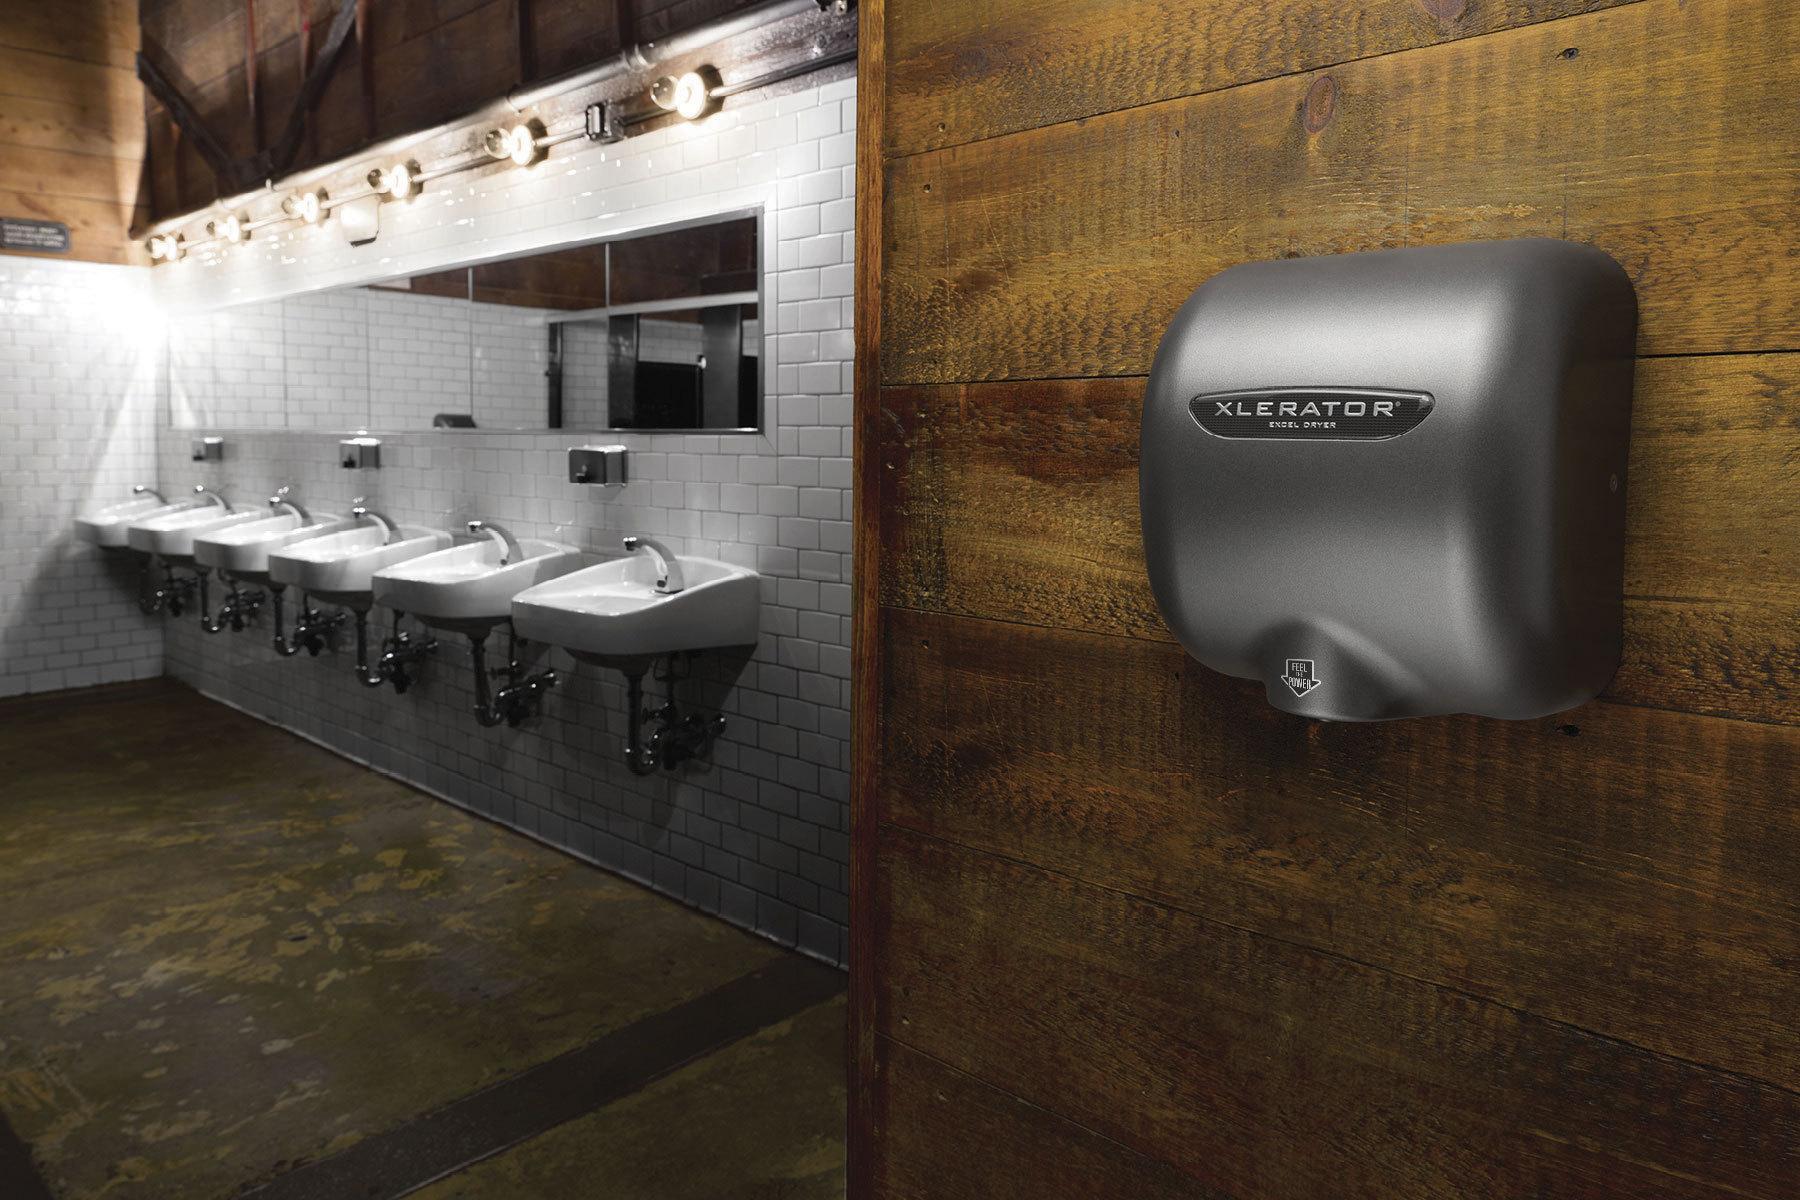 Brooklyn Bowl hand dryer installation photo (Photo: Business Wire)